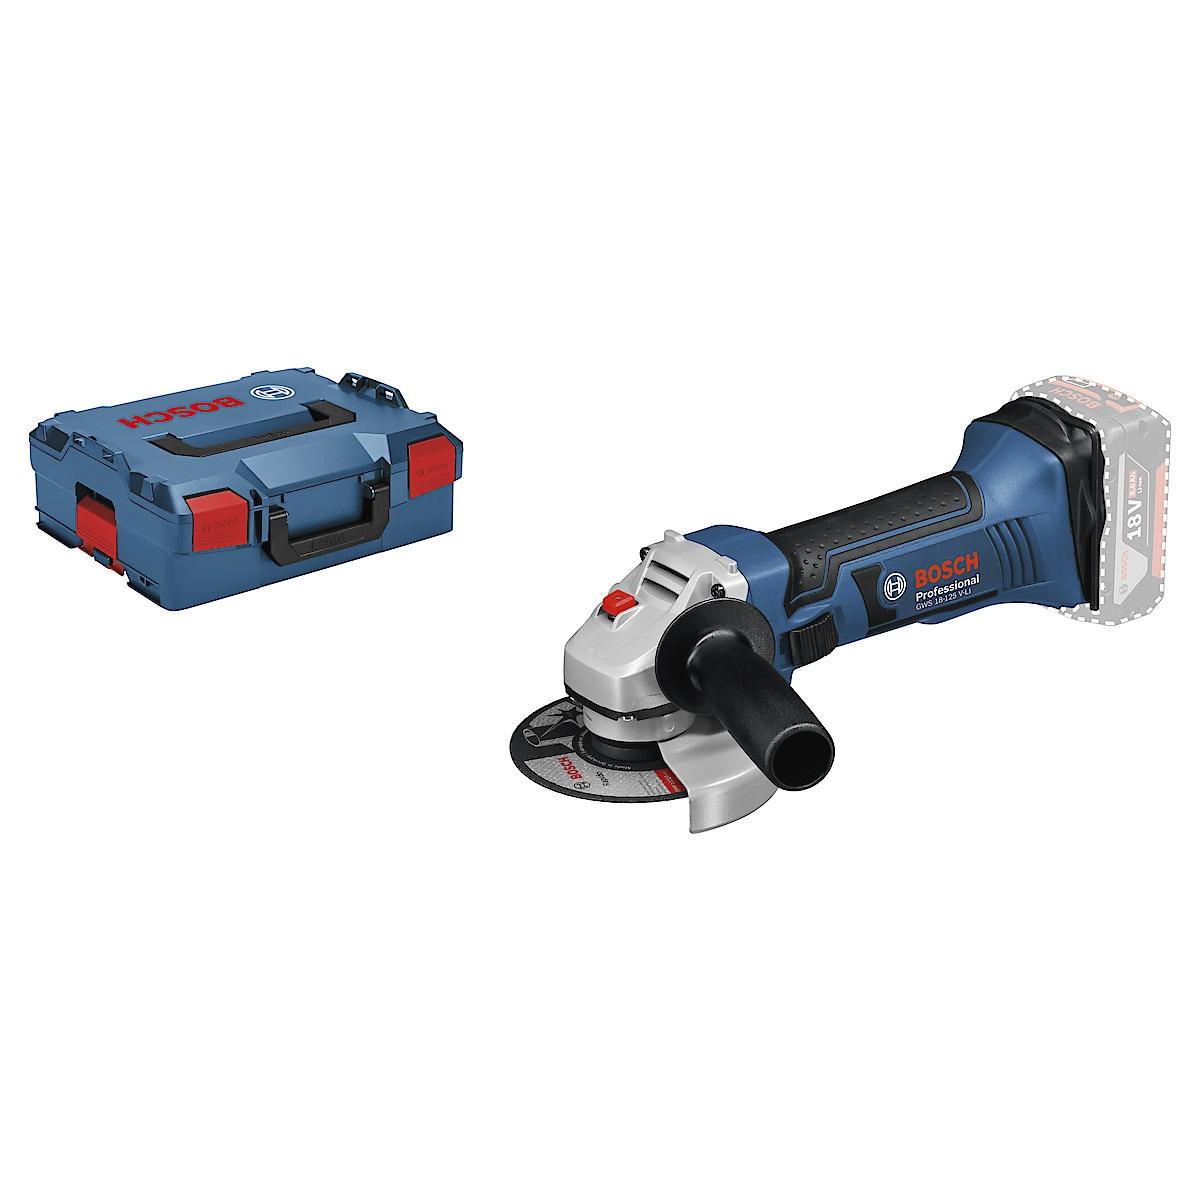 Vinkelslip GWS 18-125 V-LI Professional